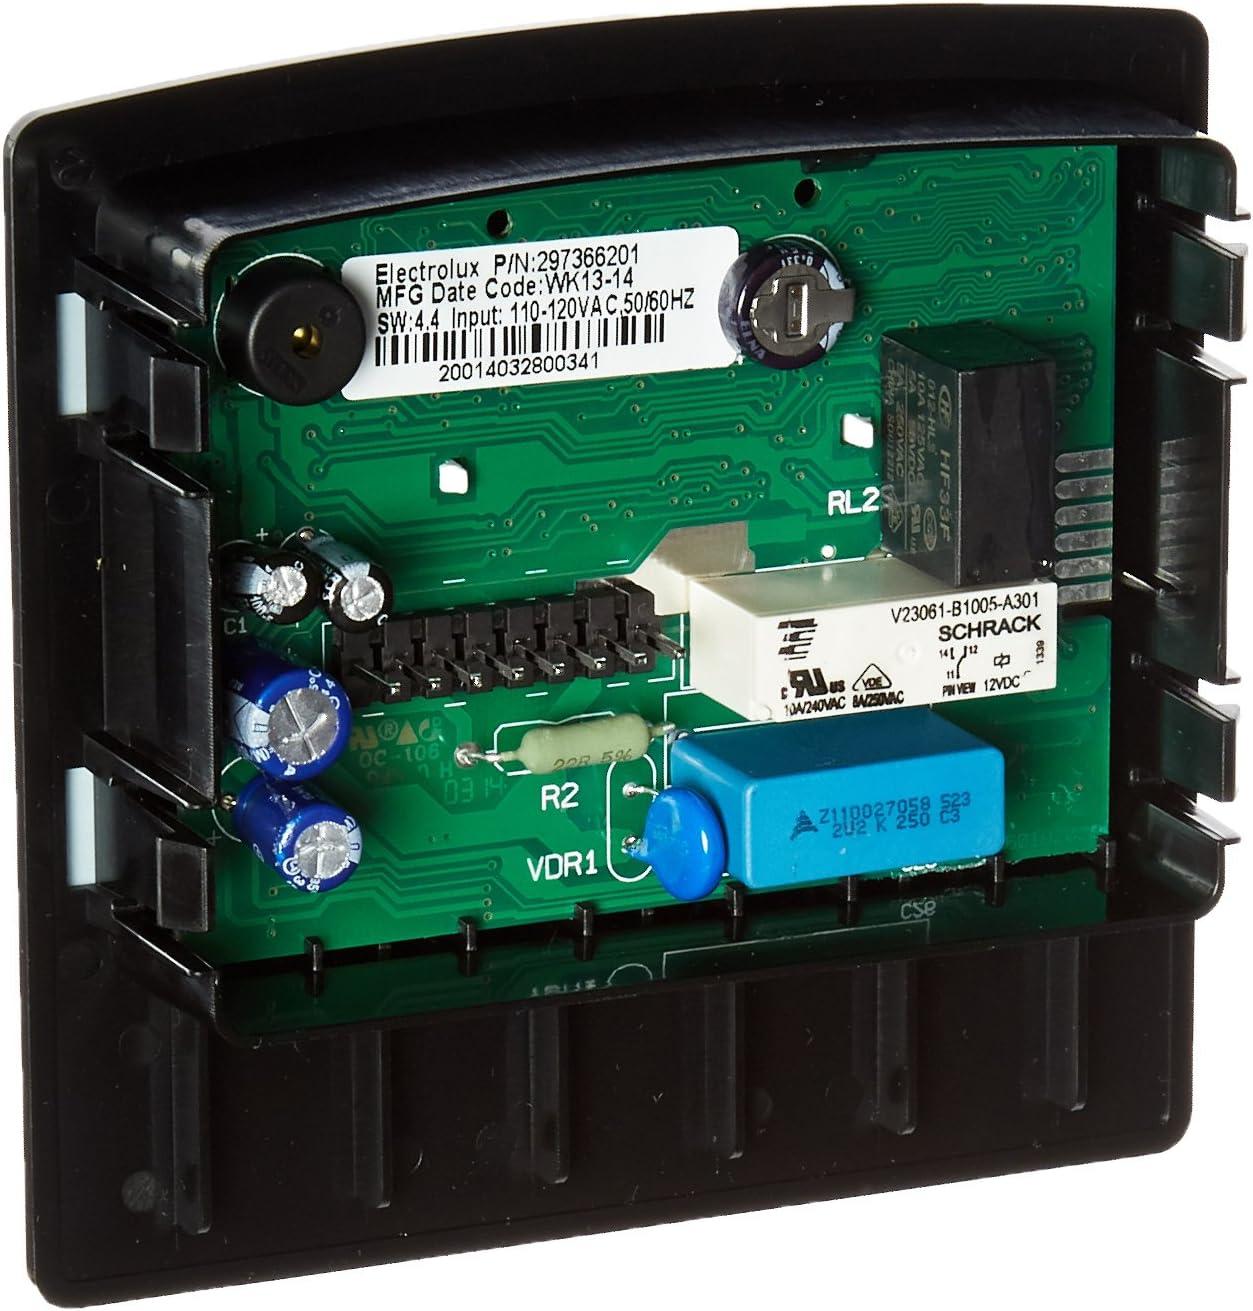 297366204 Freezer Electronic Control Assembly Genuine Original Equipment Manufacturer Part Black OEM